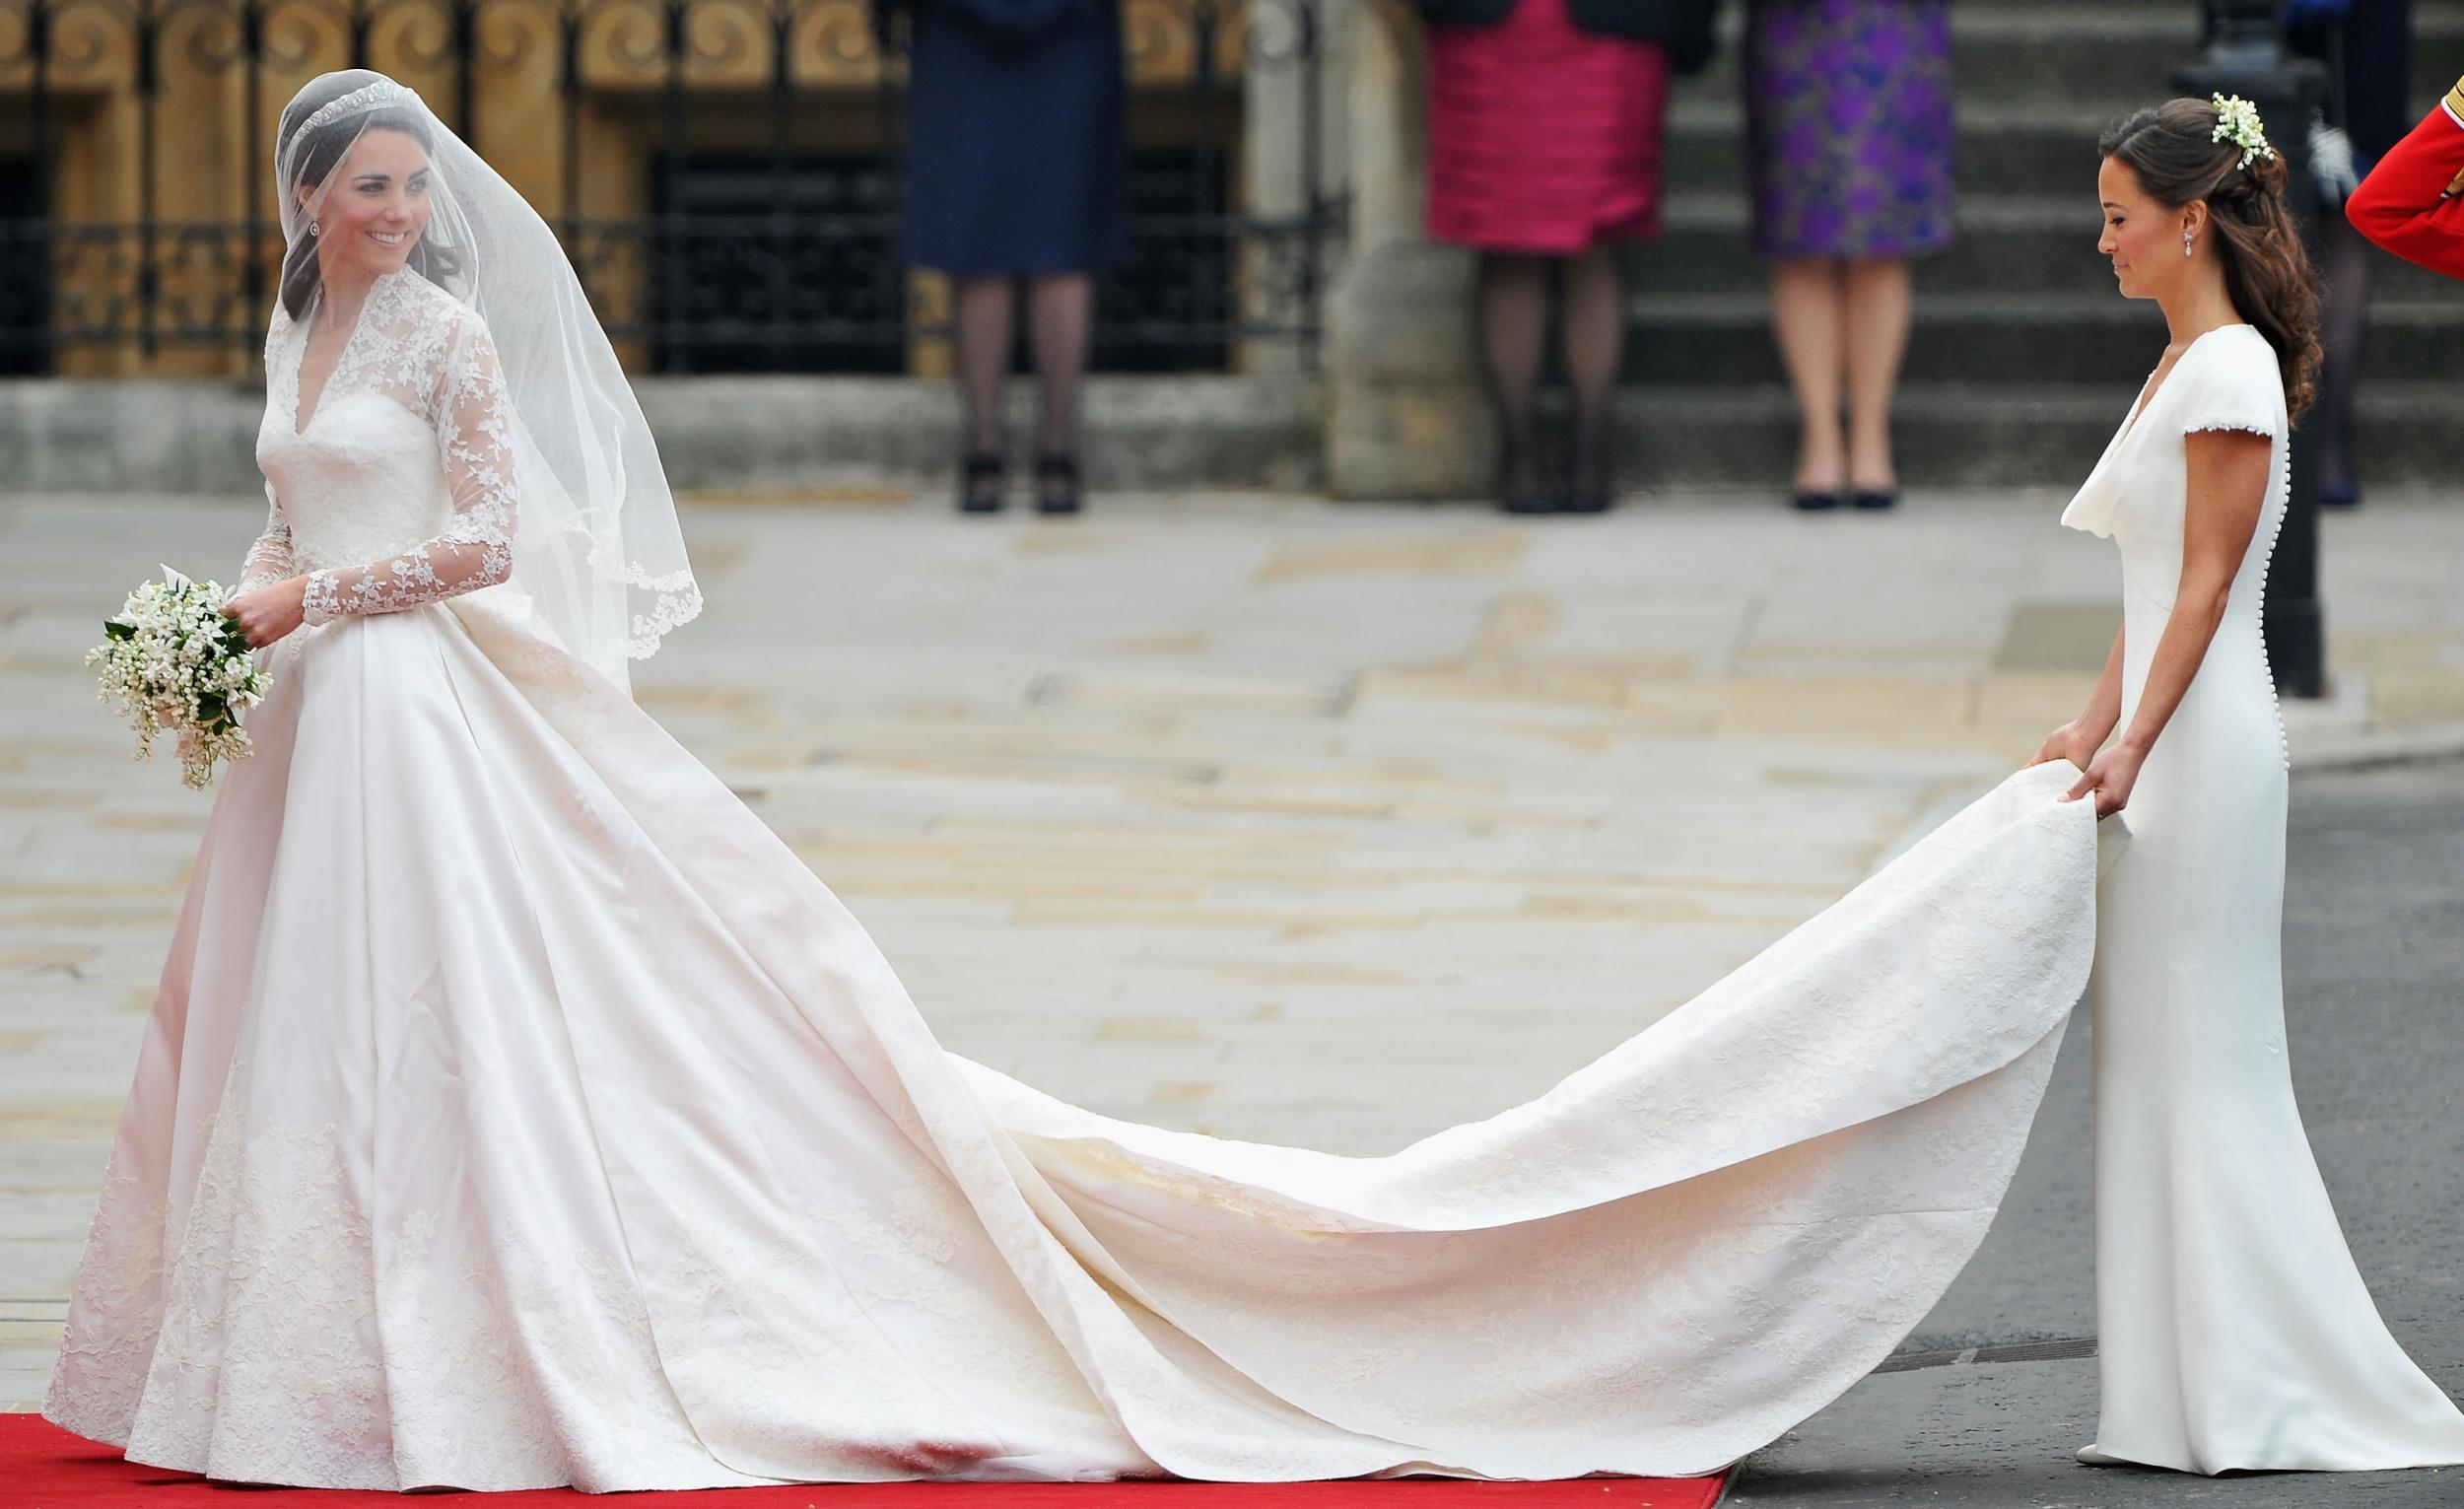 24 - Pippa Middleton's bridesmaid dress, Alexander McQueen, 2011